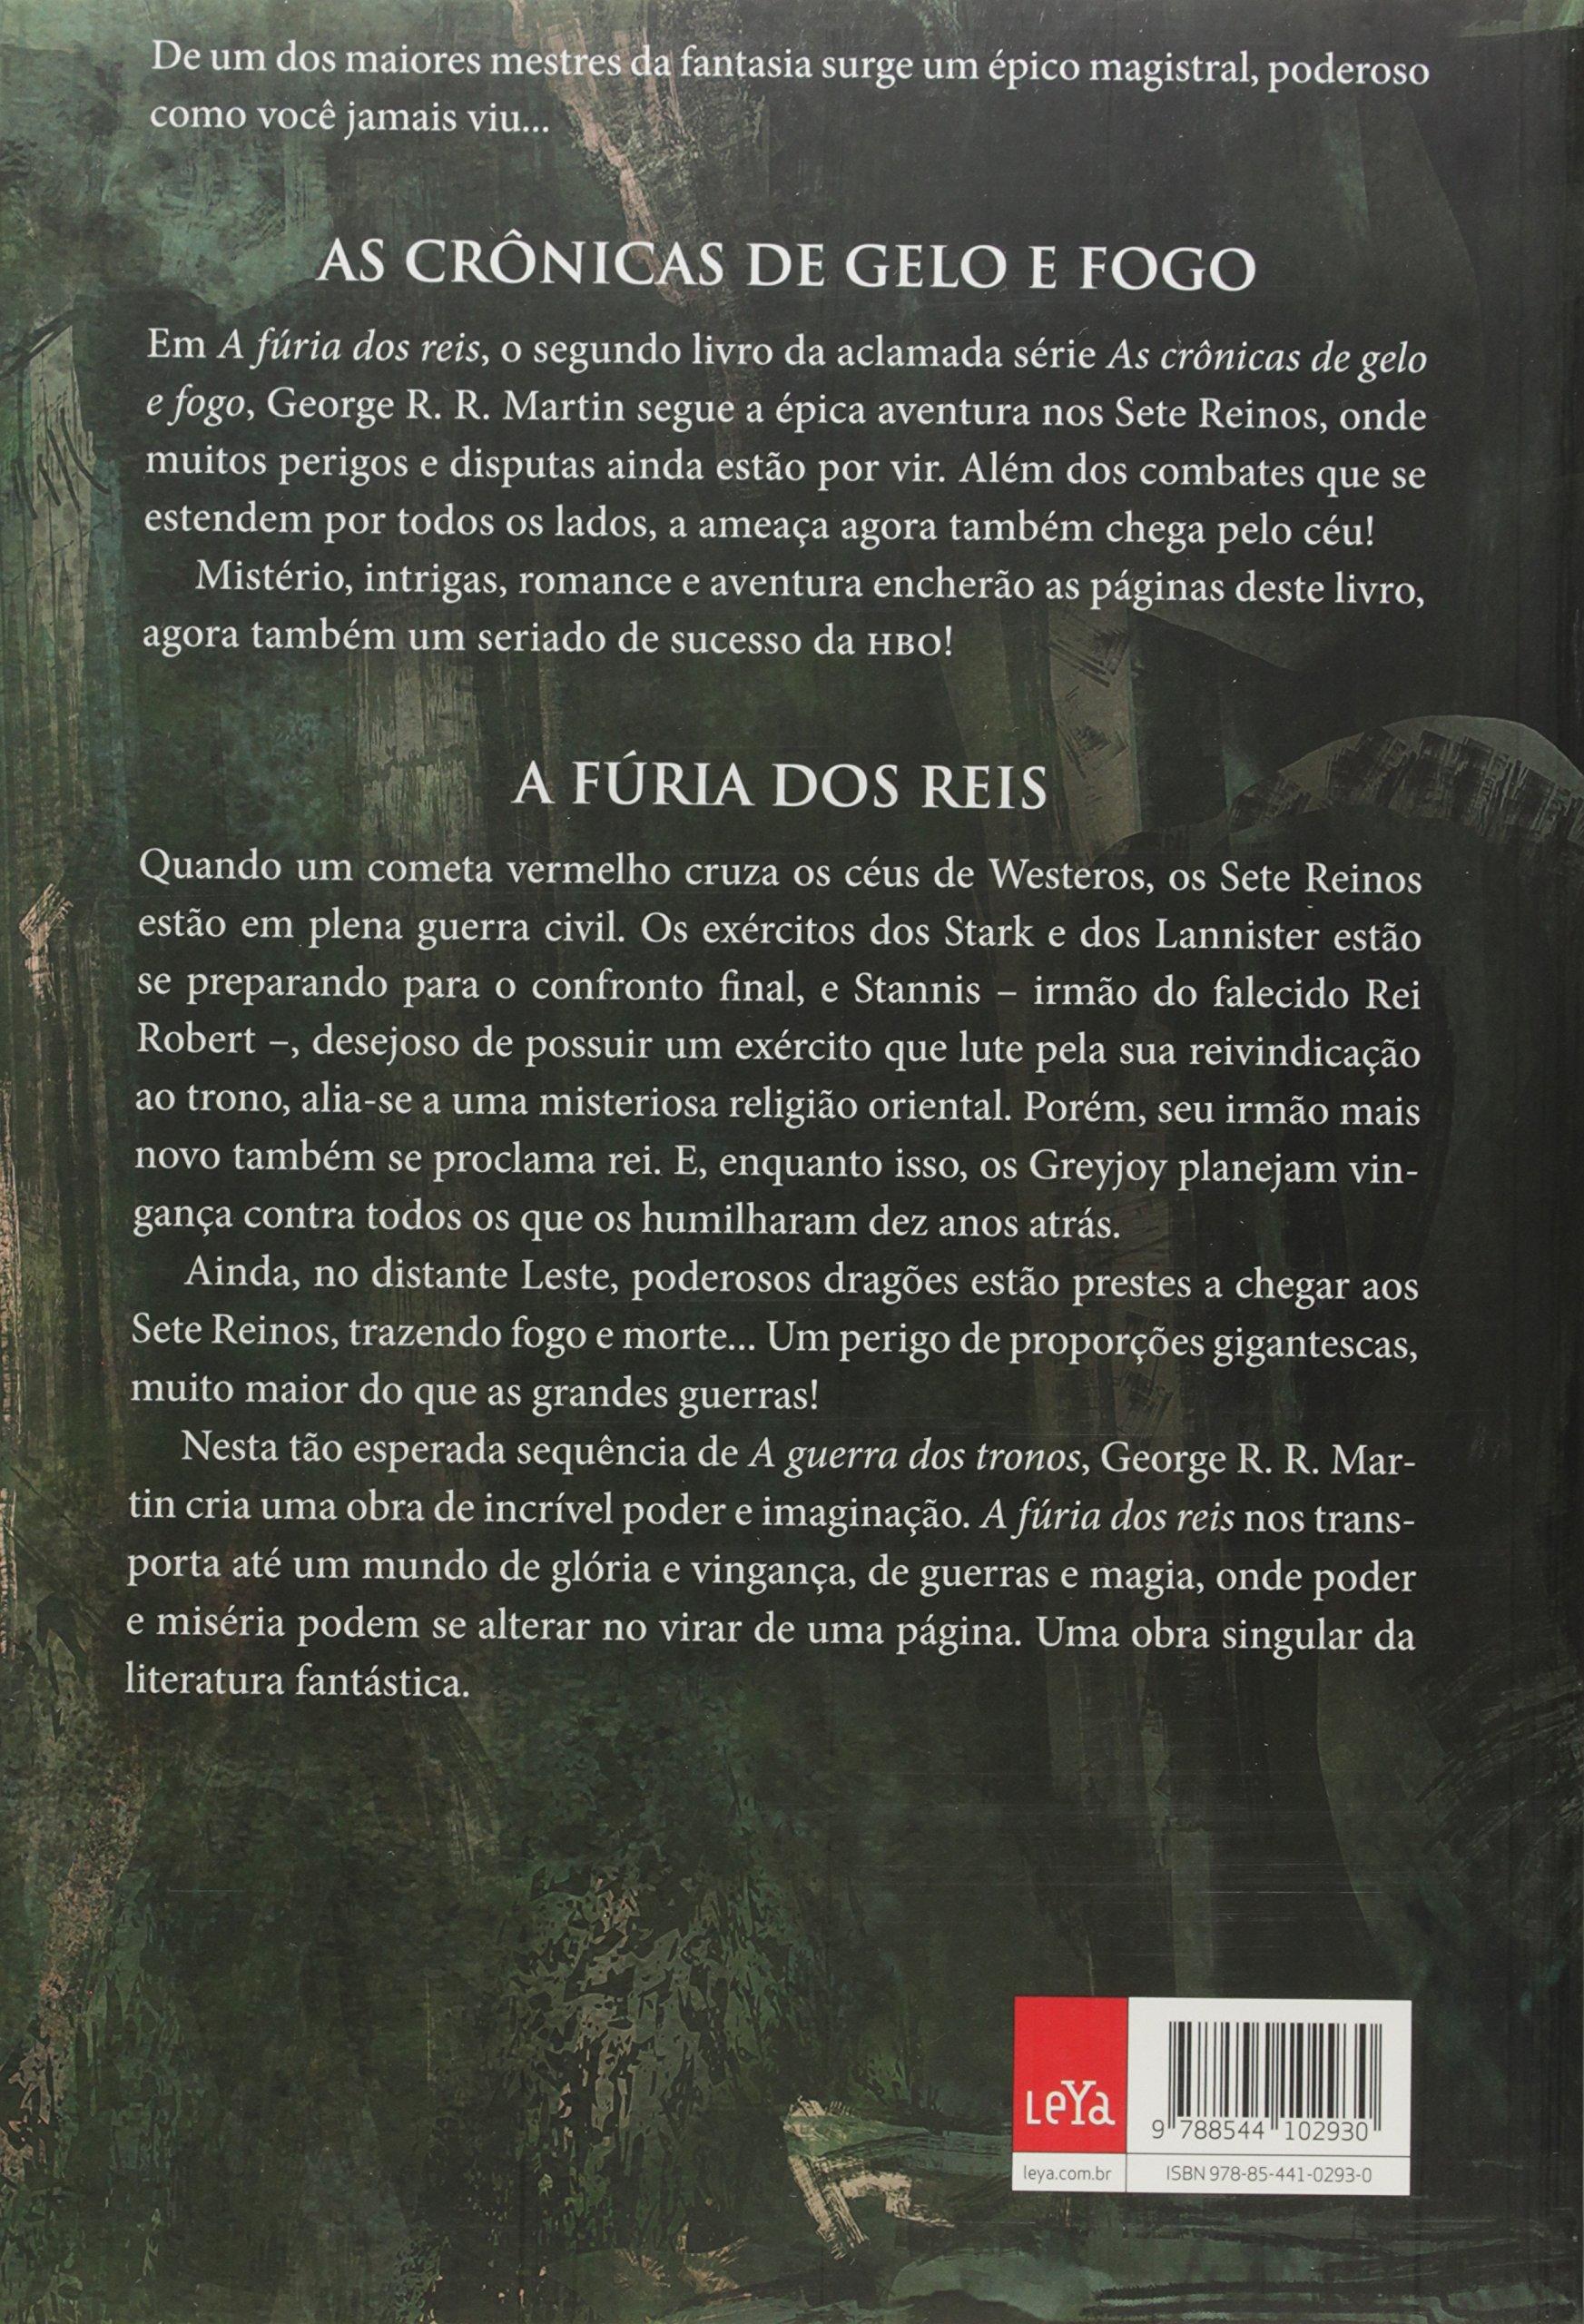 A fria dos reis as crnicas de gelo e fogo livro 2 em as crnicas de gelo e fogo livro 2 em portuguese do brasil george r r martin 9788544102930 amazon books fandeluxe Choice Image